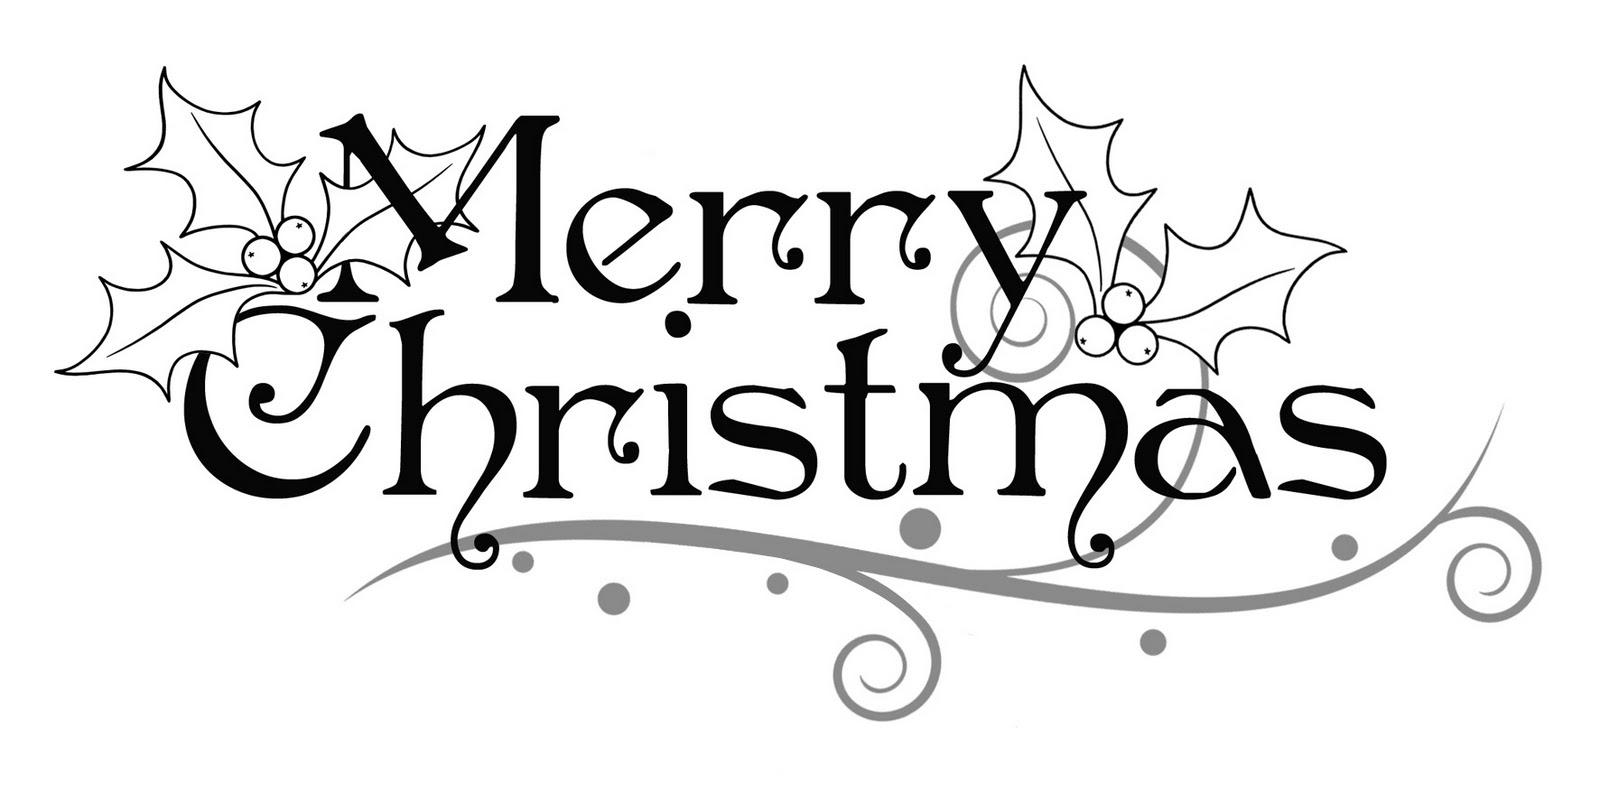 94 Merry Christmas Rustic Clip Art